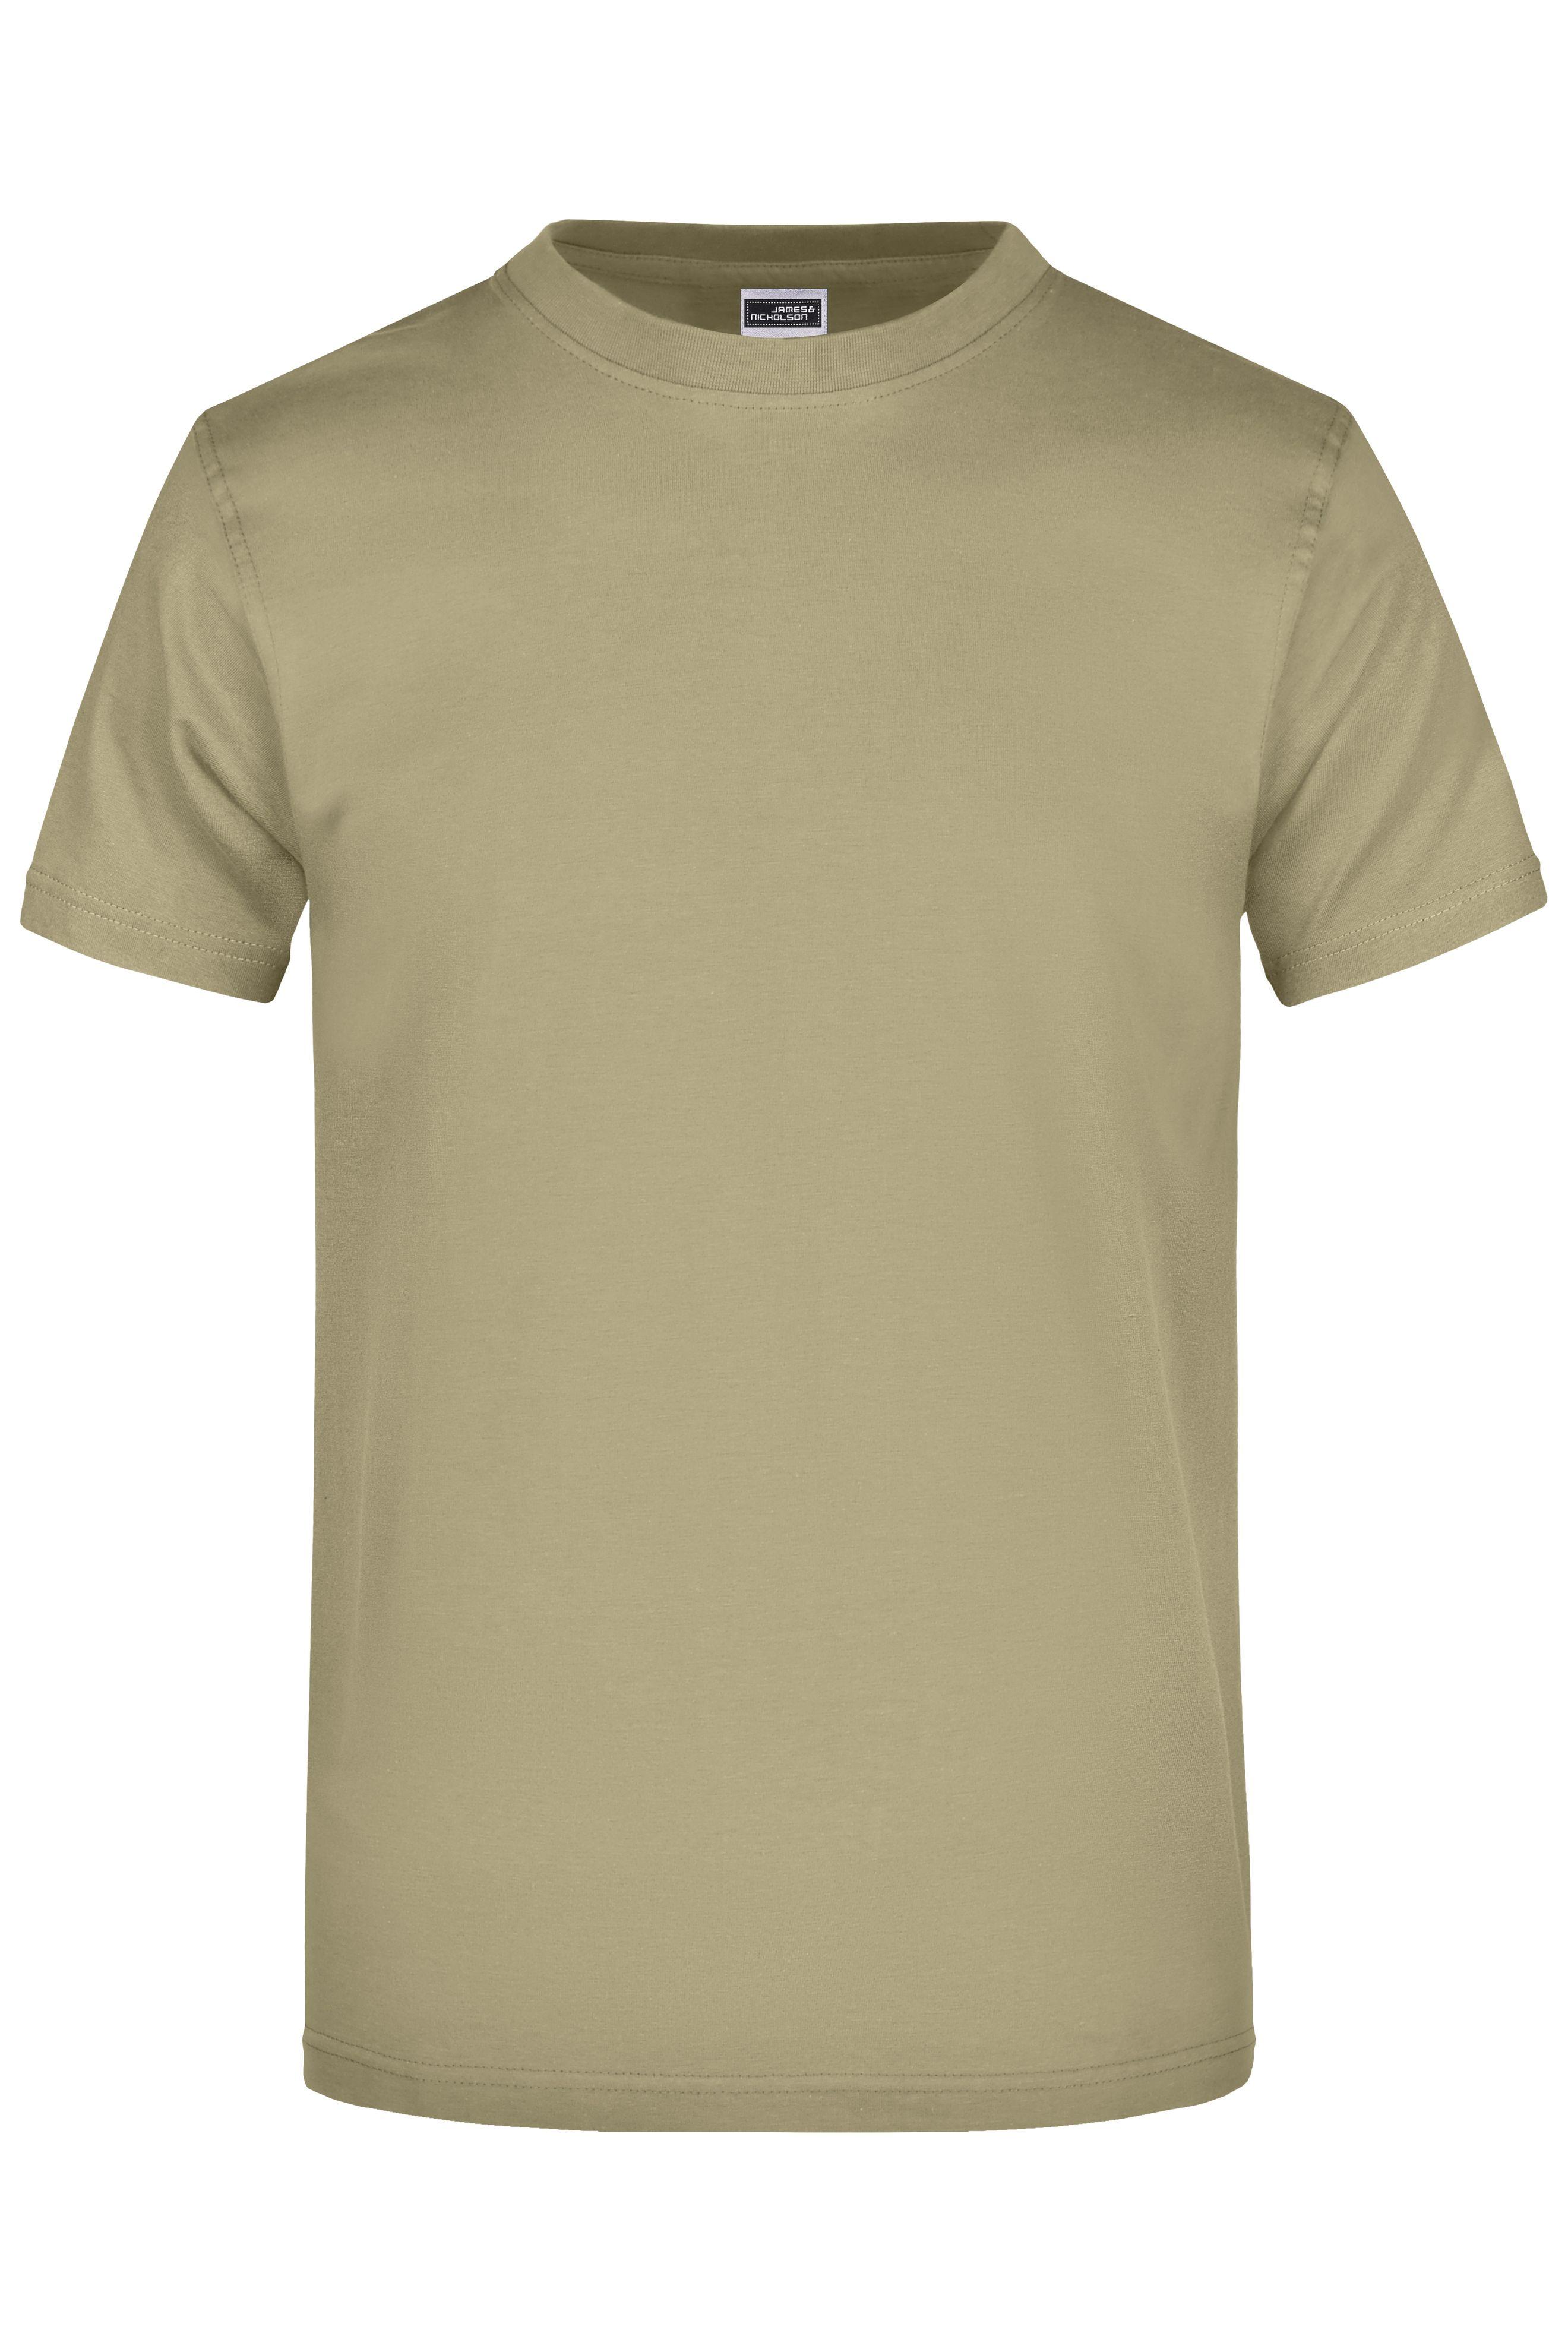 Komfort-T-Shirt aus strapazierfähigem Single-Jersey